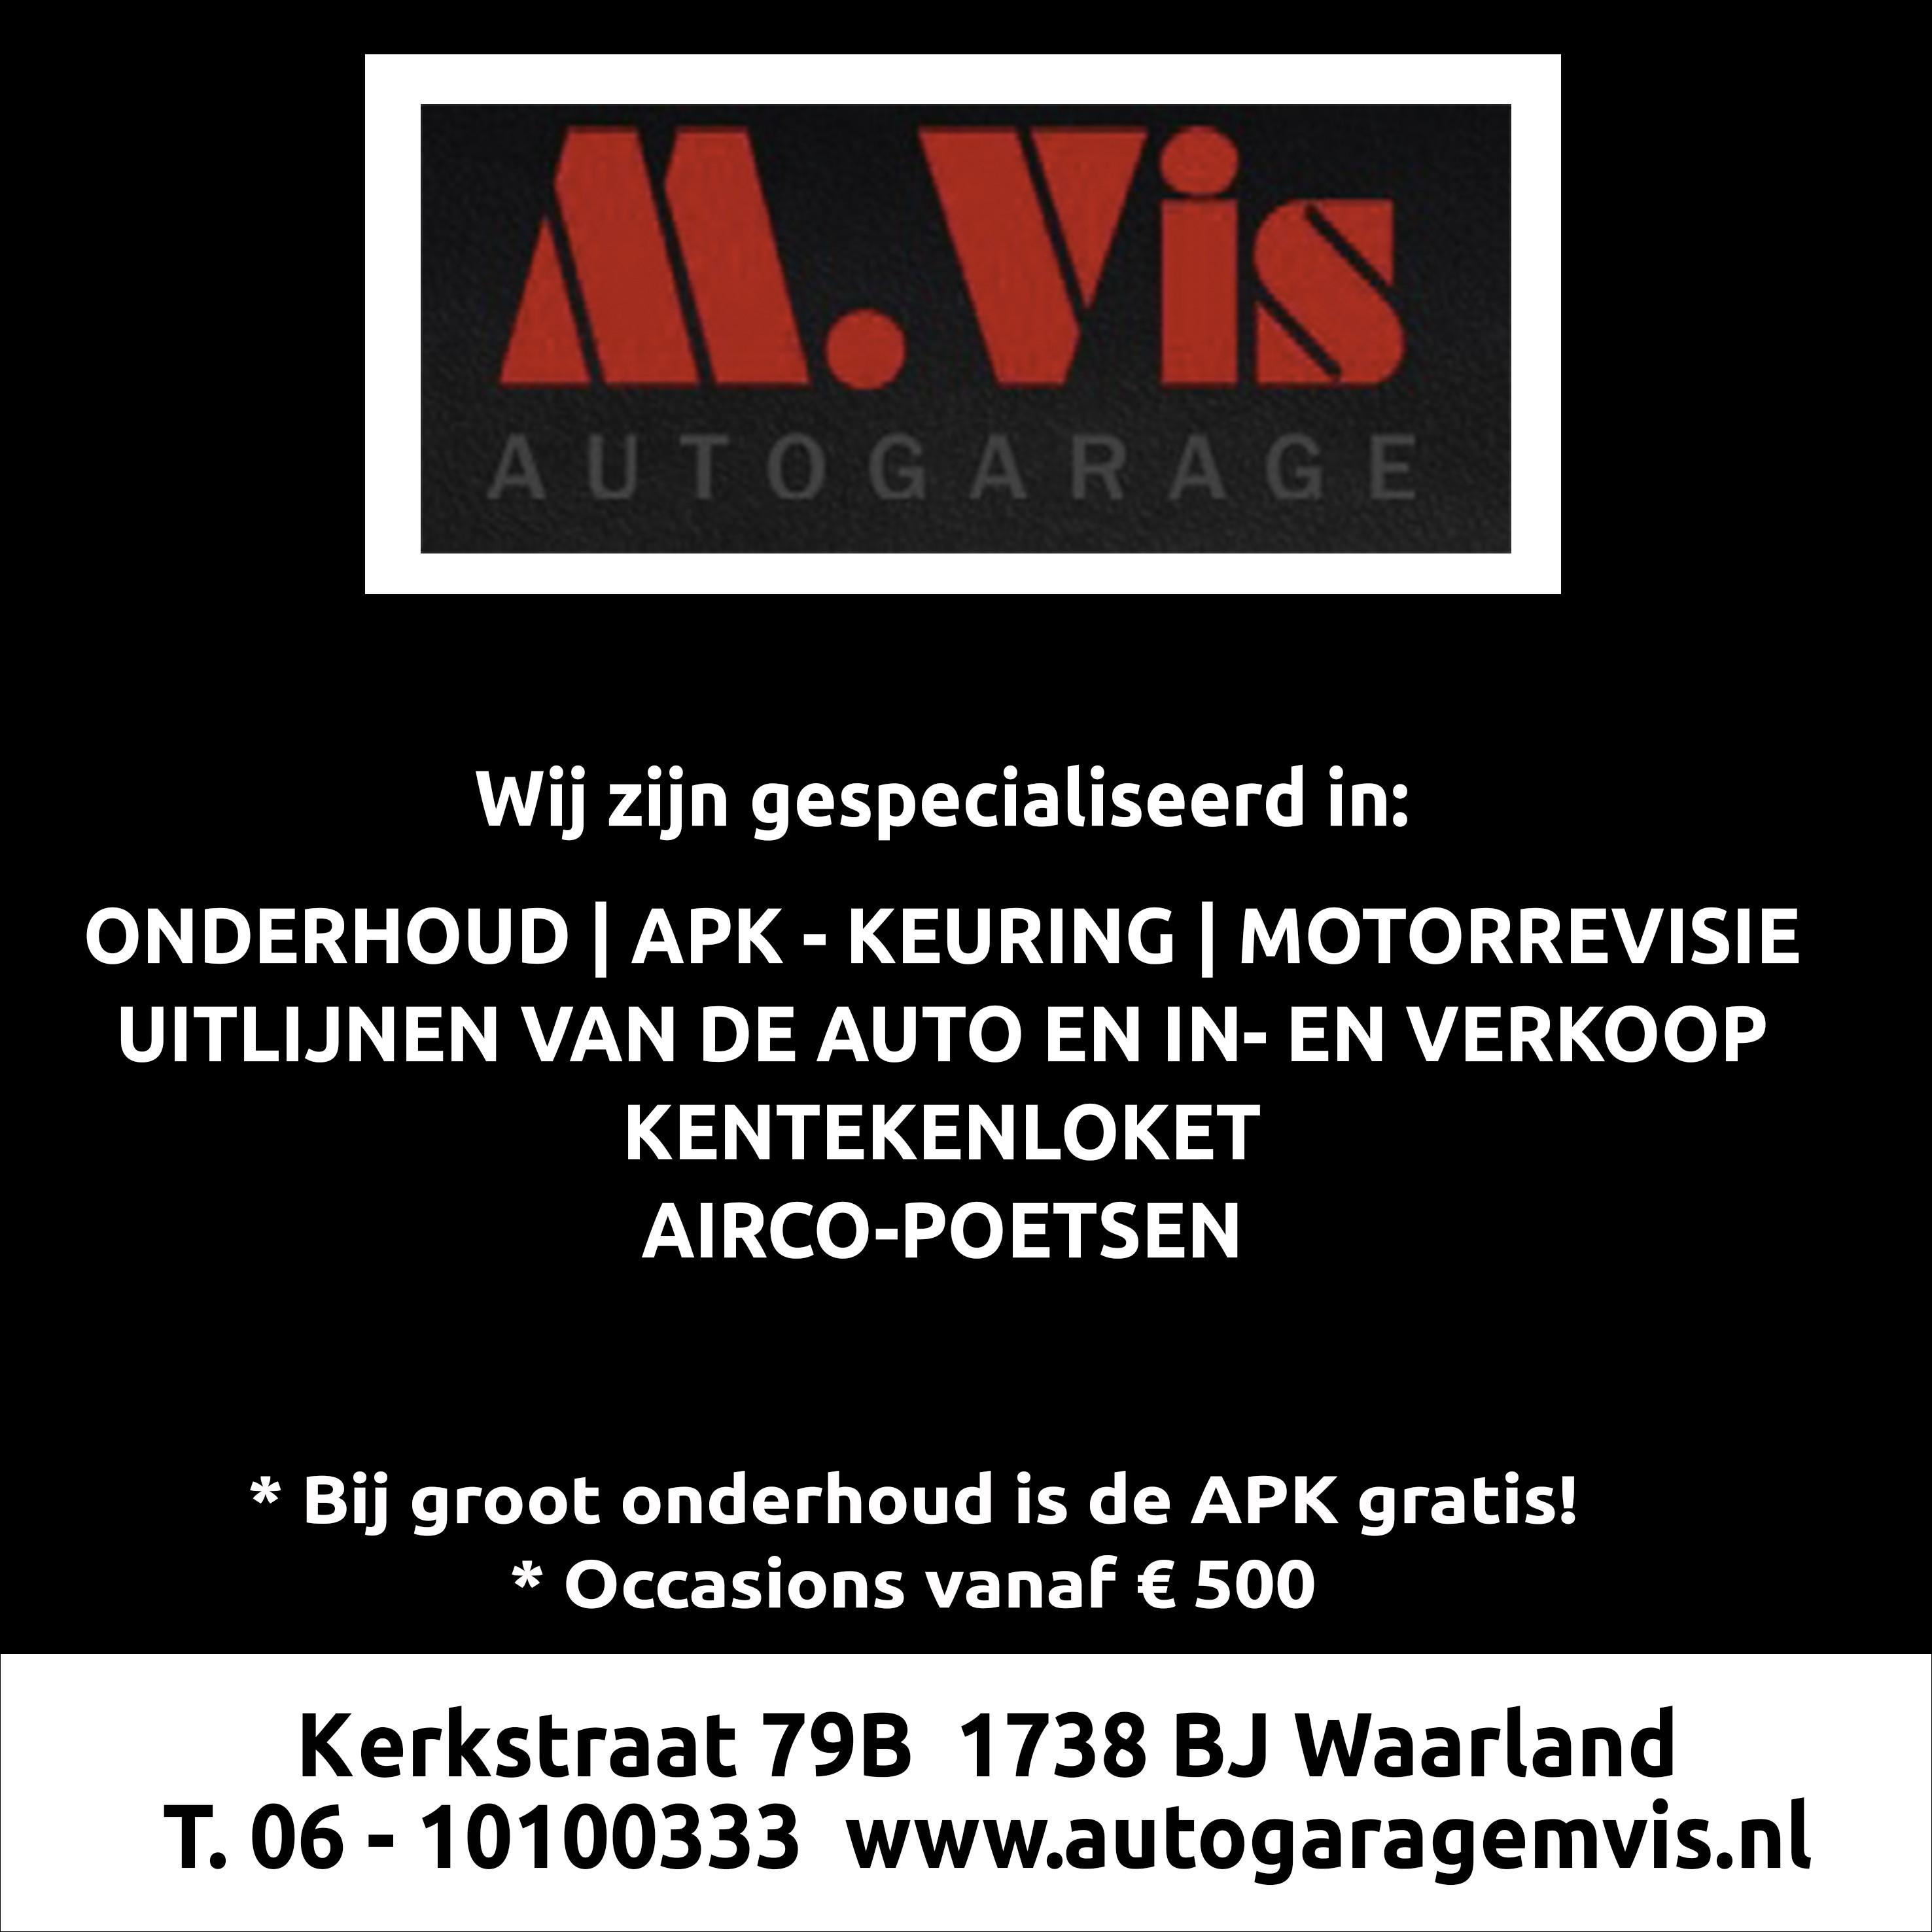 www.autogaragemvis.nl